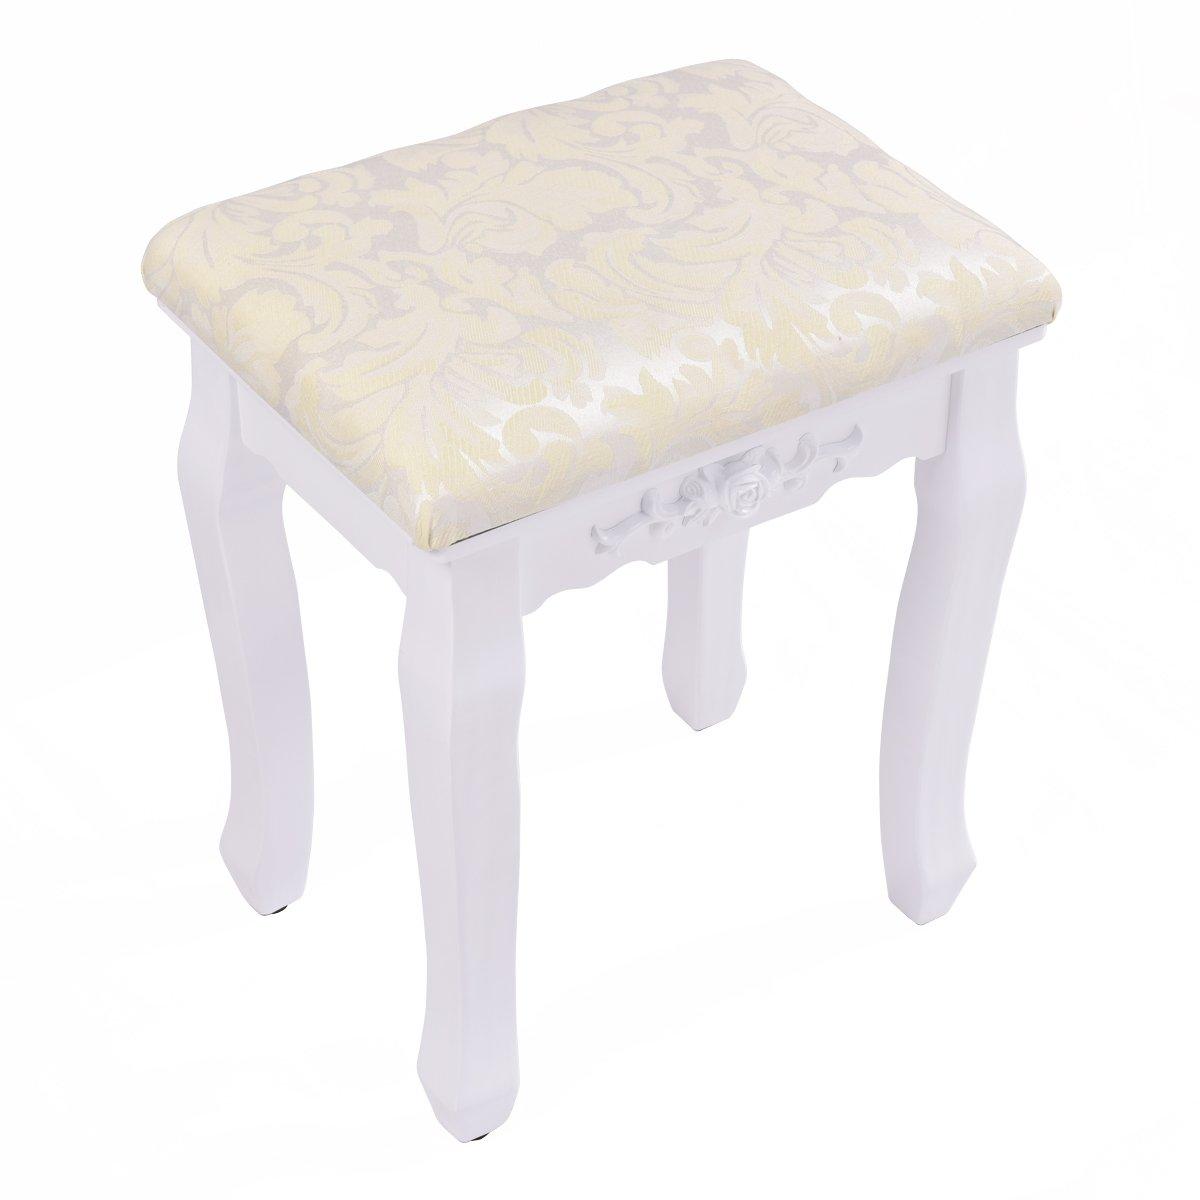 bath vanity stools amazon com rh amazon com contemporary vanity chairs for bathroom small vanity stool for bathroom